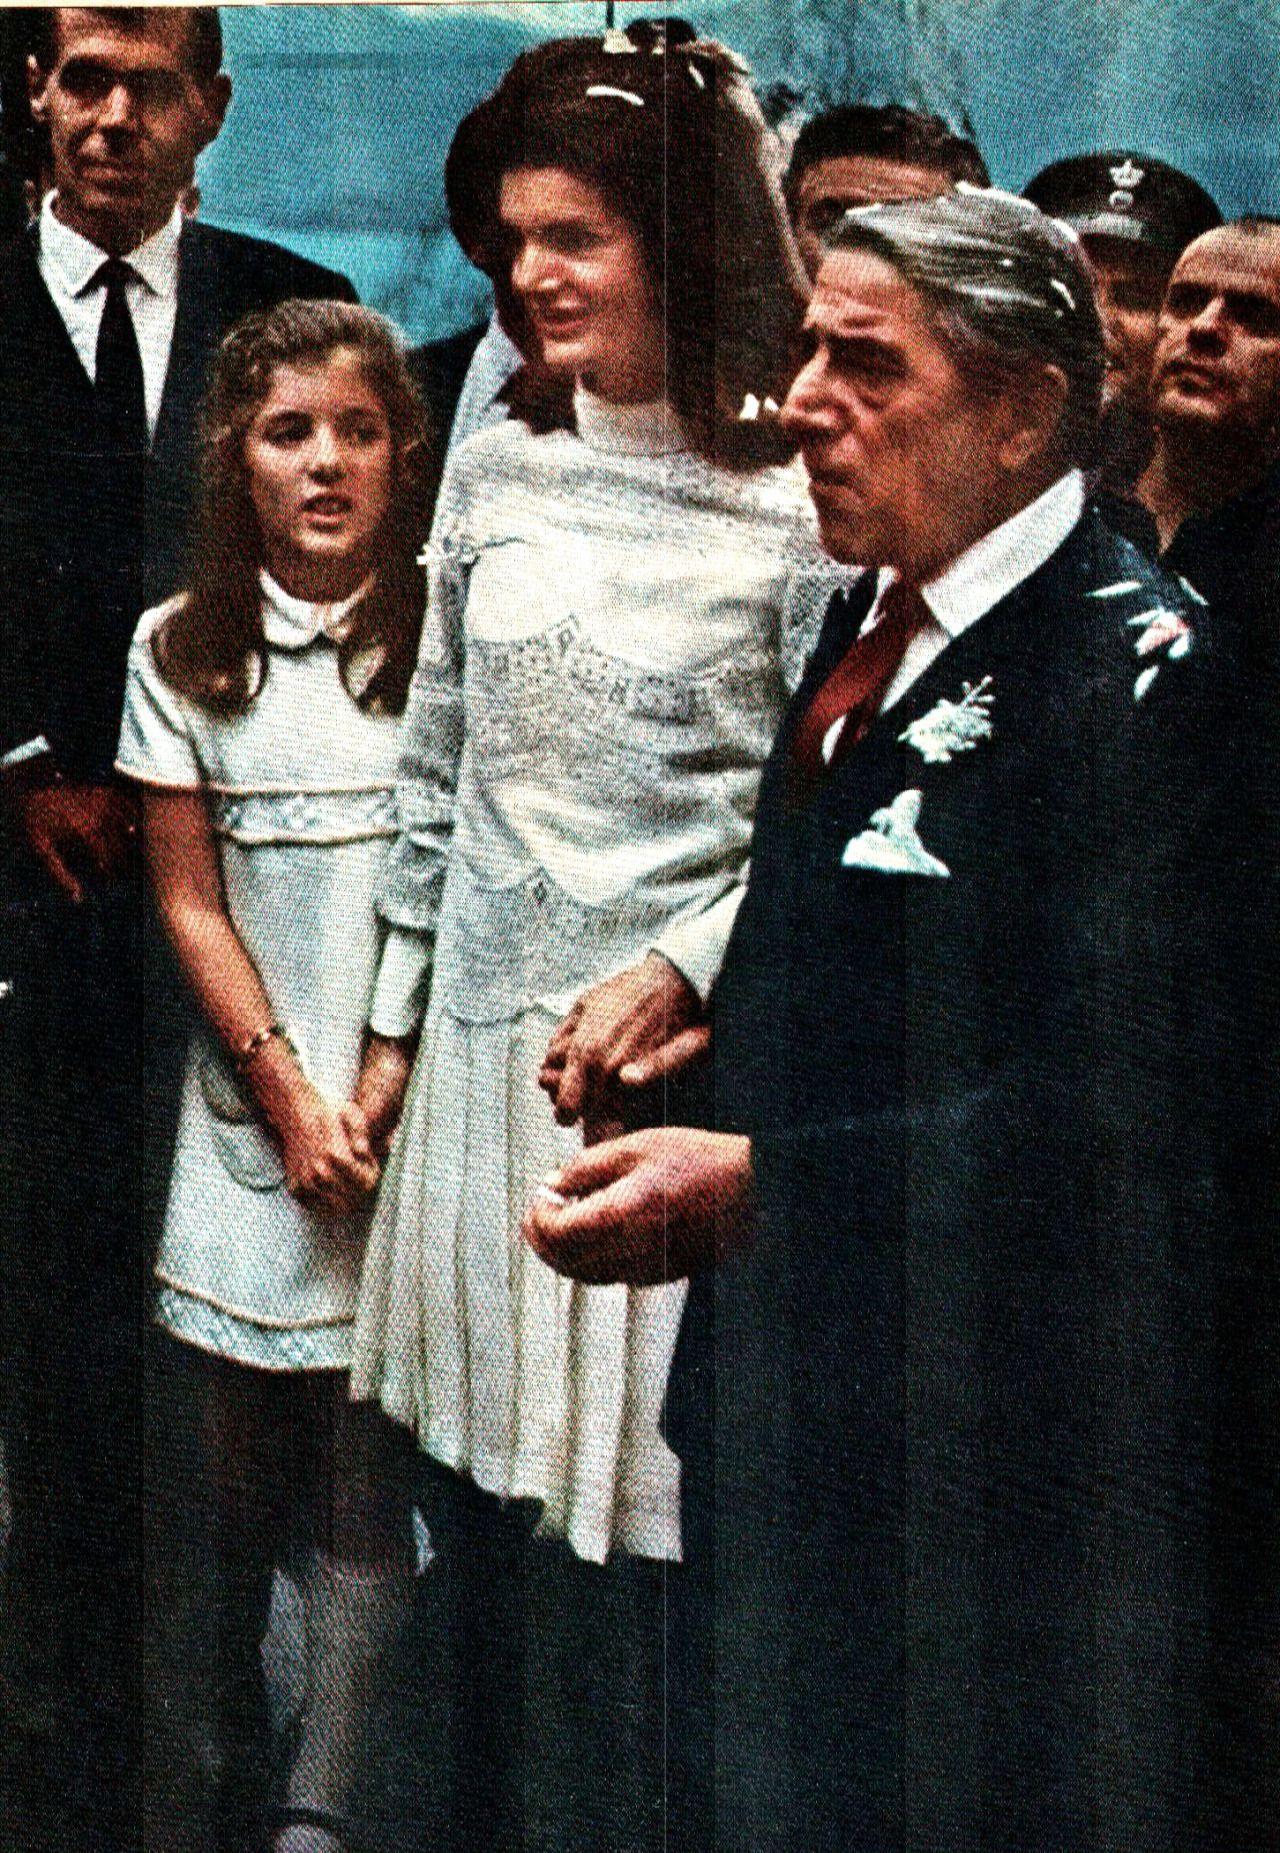 Jackie with John John   Жаклин кеннеди онассис, Джон